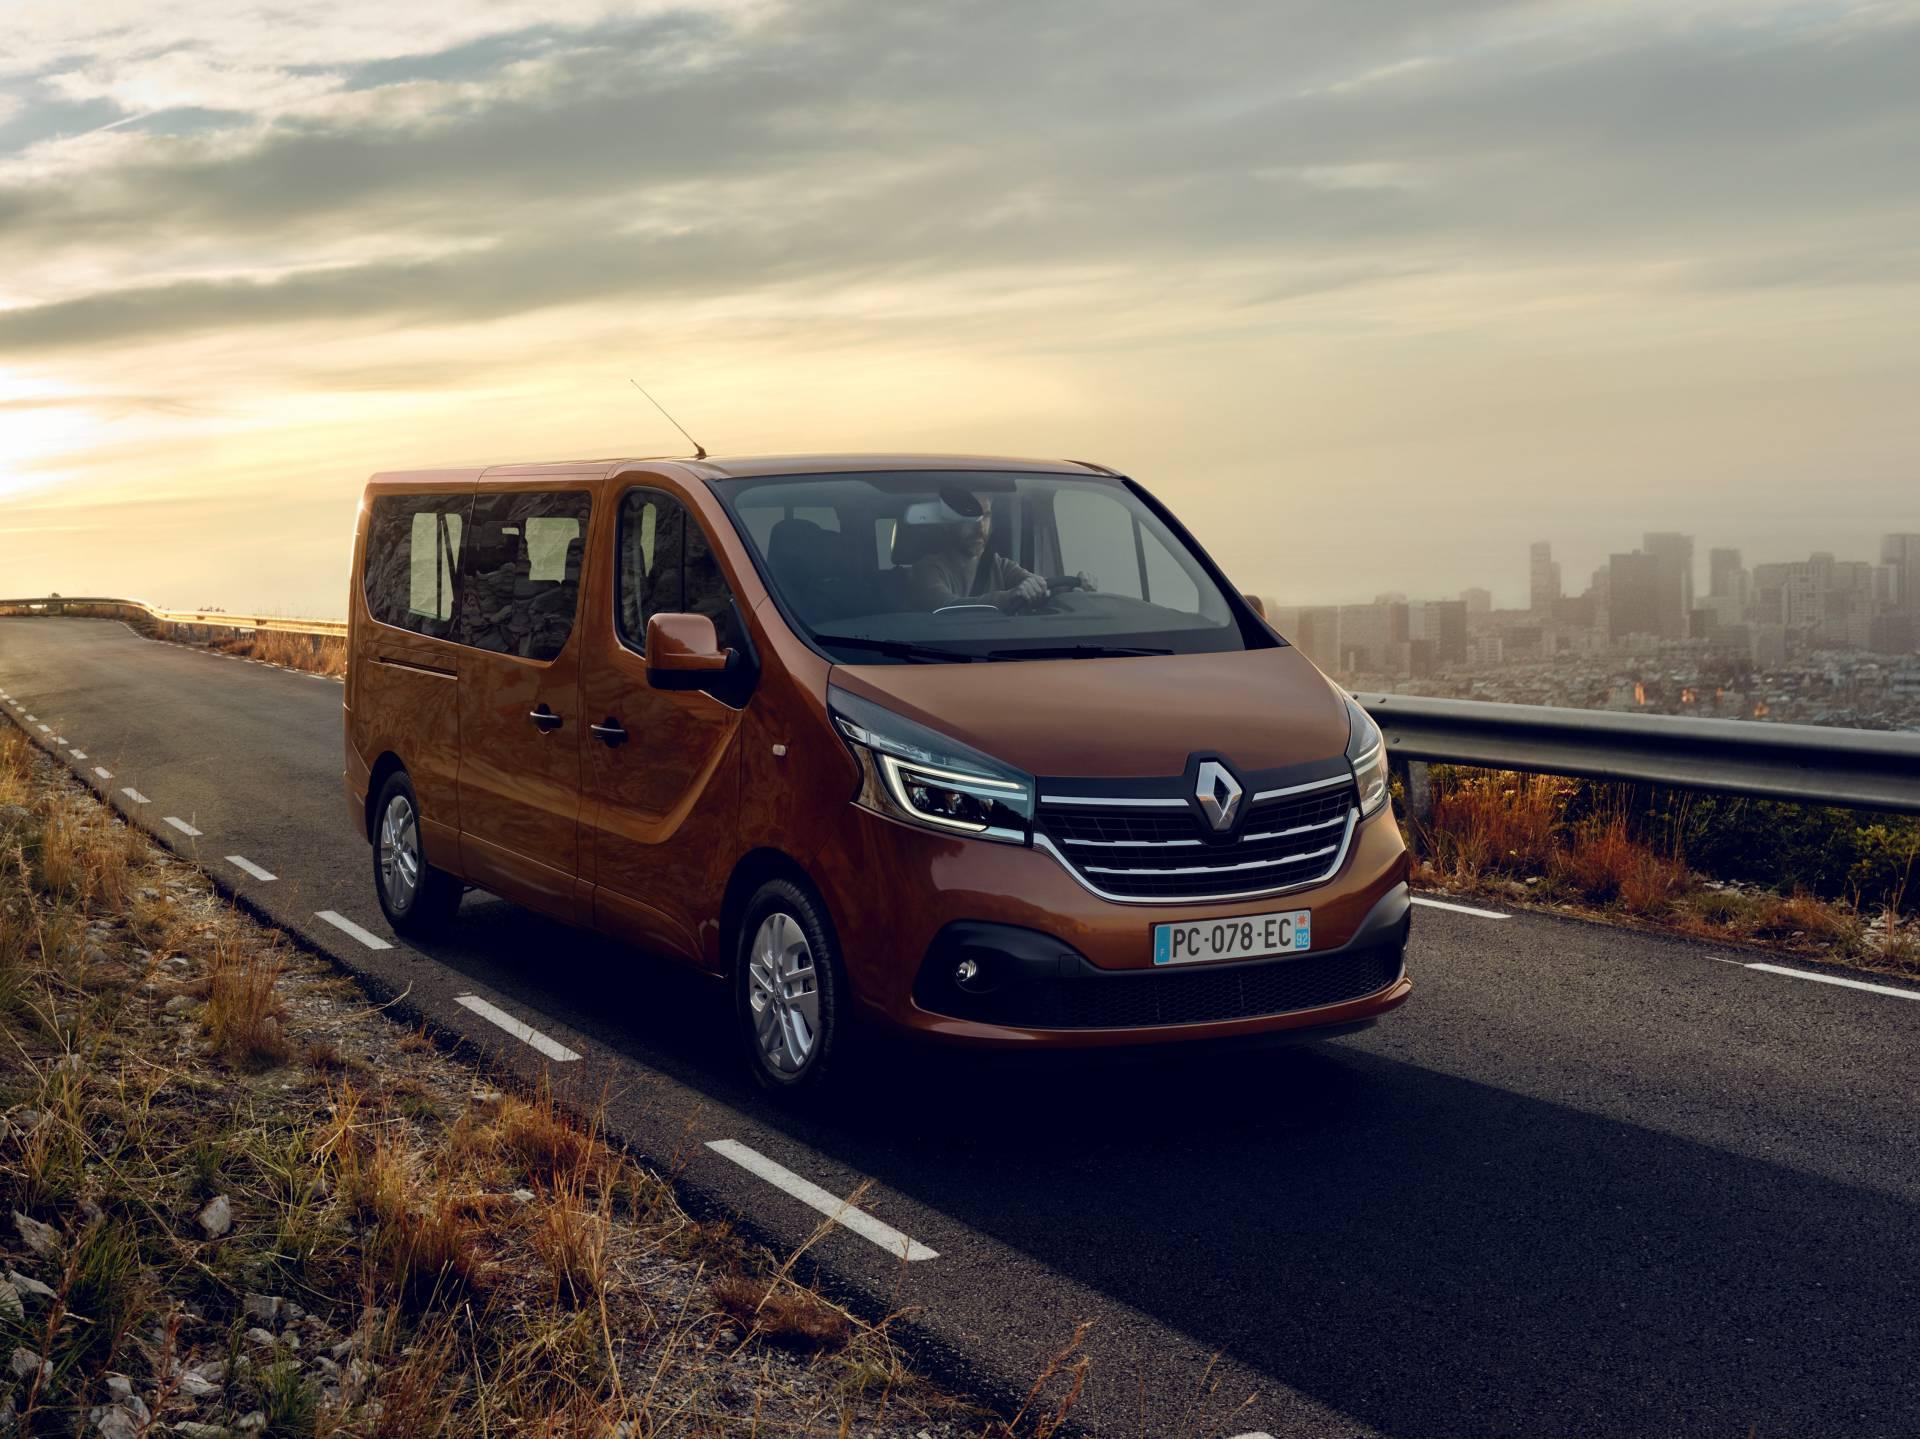 d4c3e8d7-2019my-renault-trafic-van-facelift-26